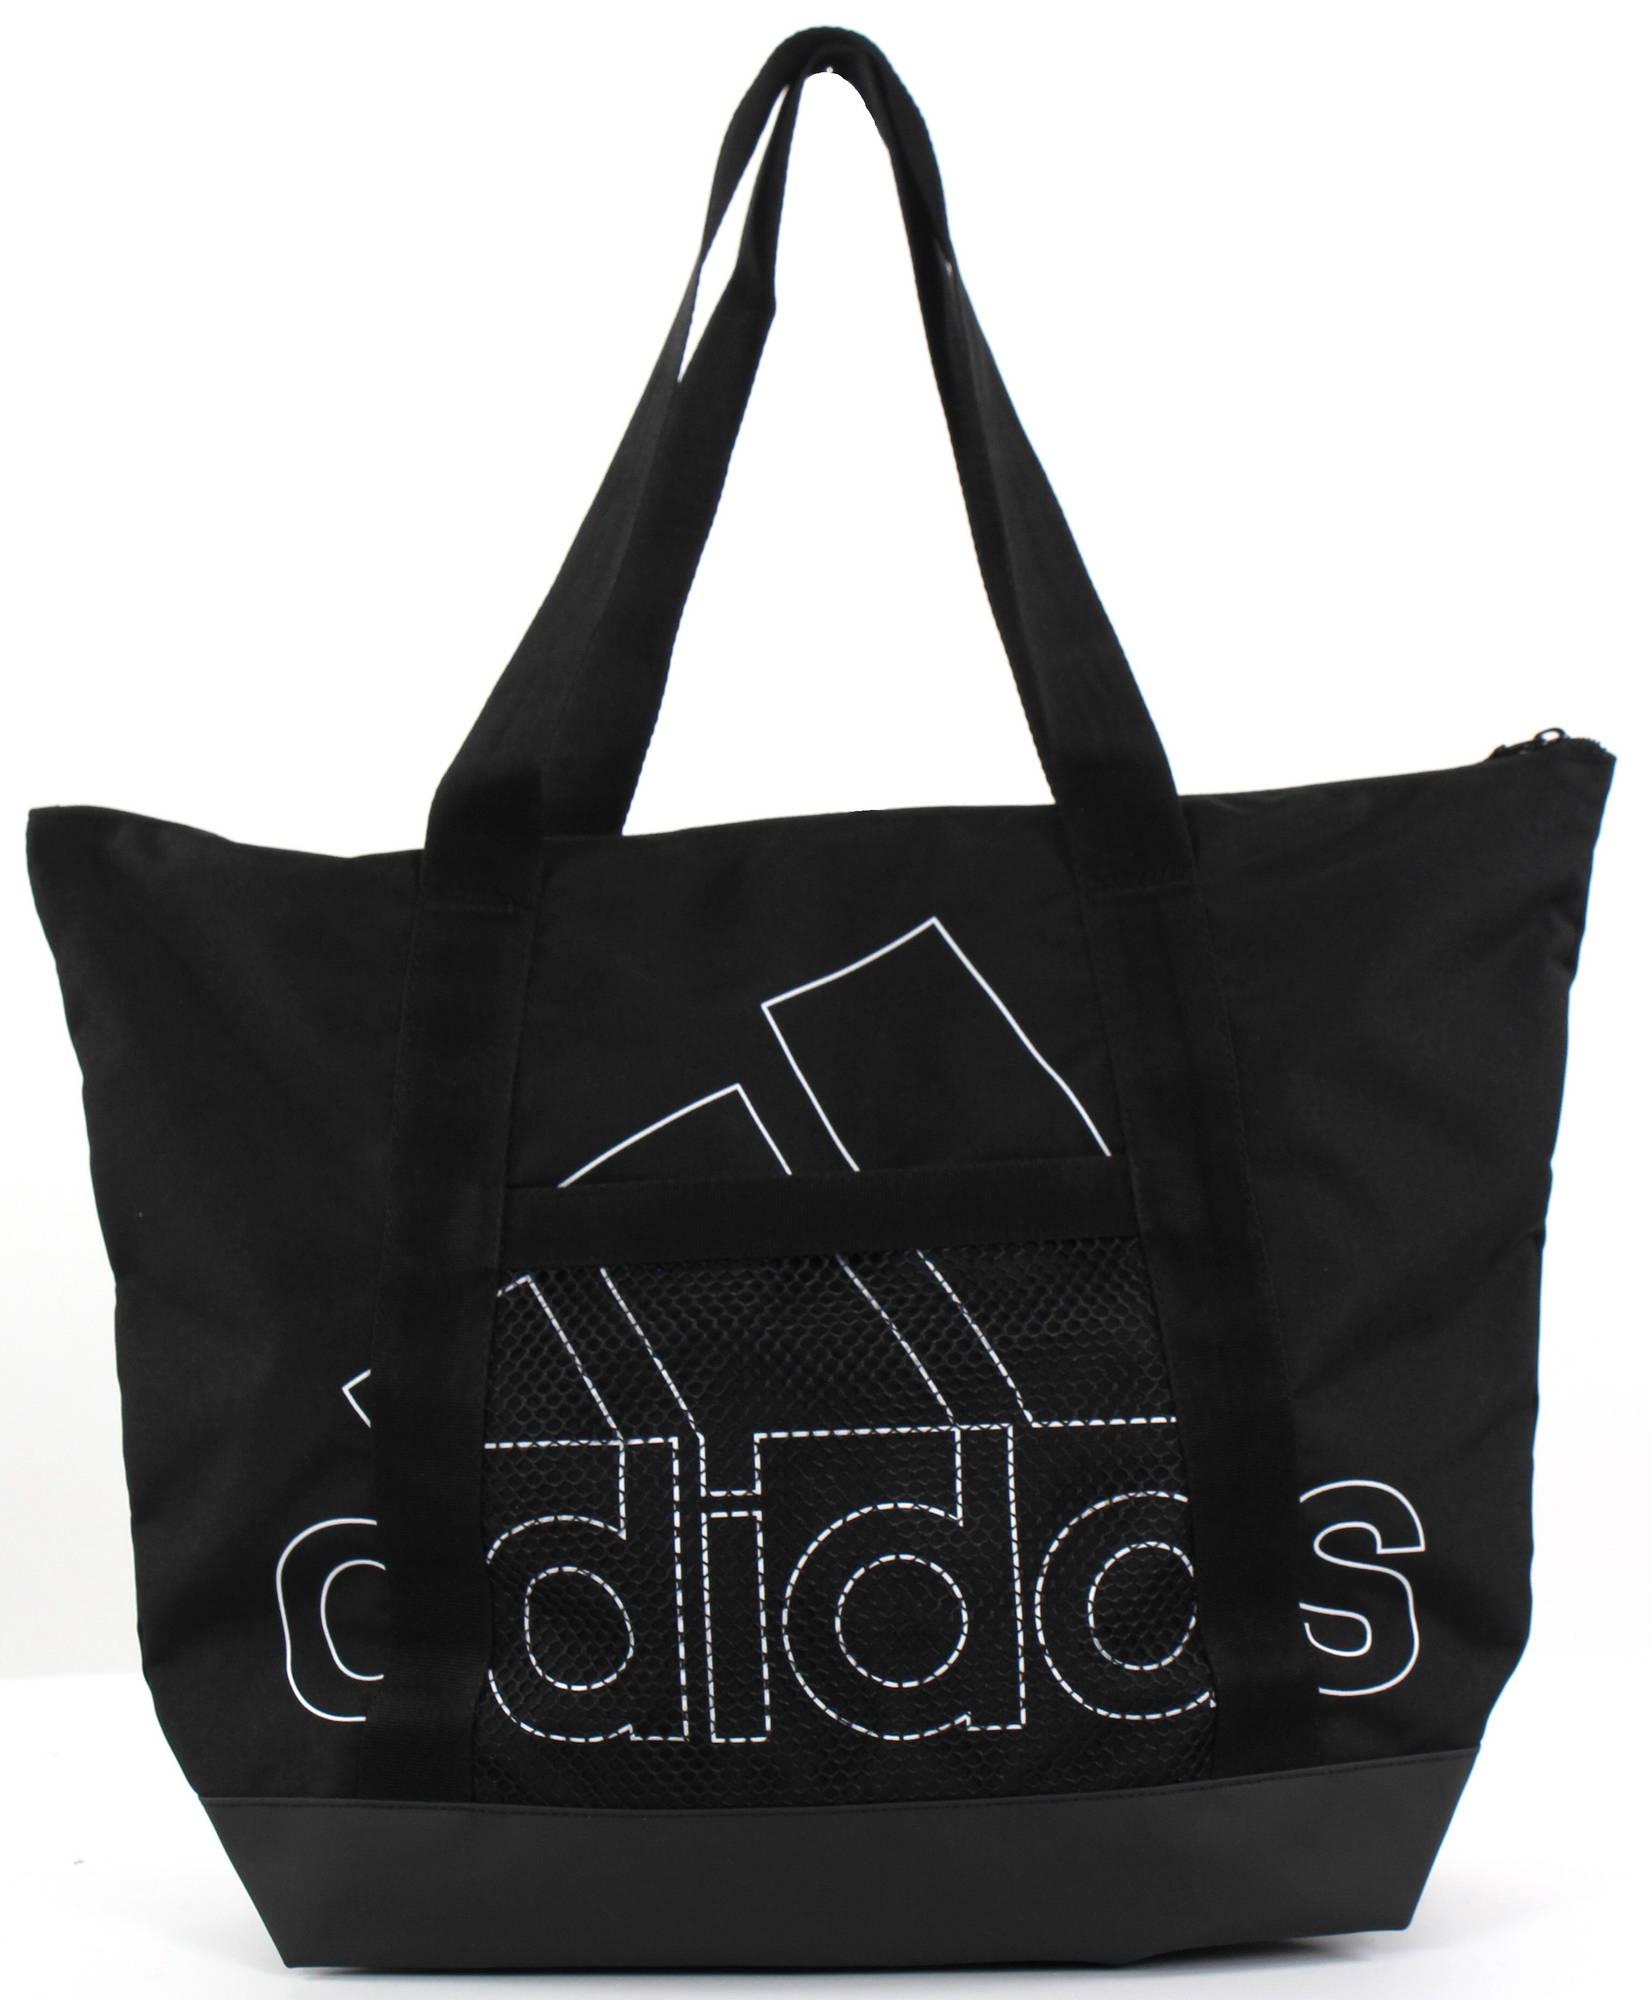 Köp dina Adidas på webben Stilettoshop.se